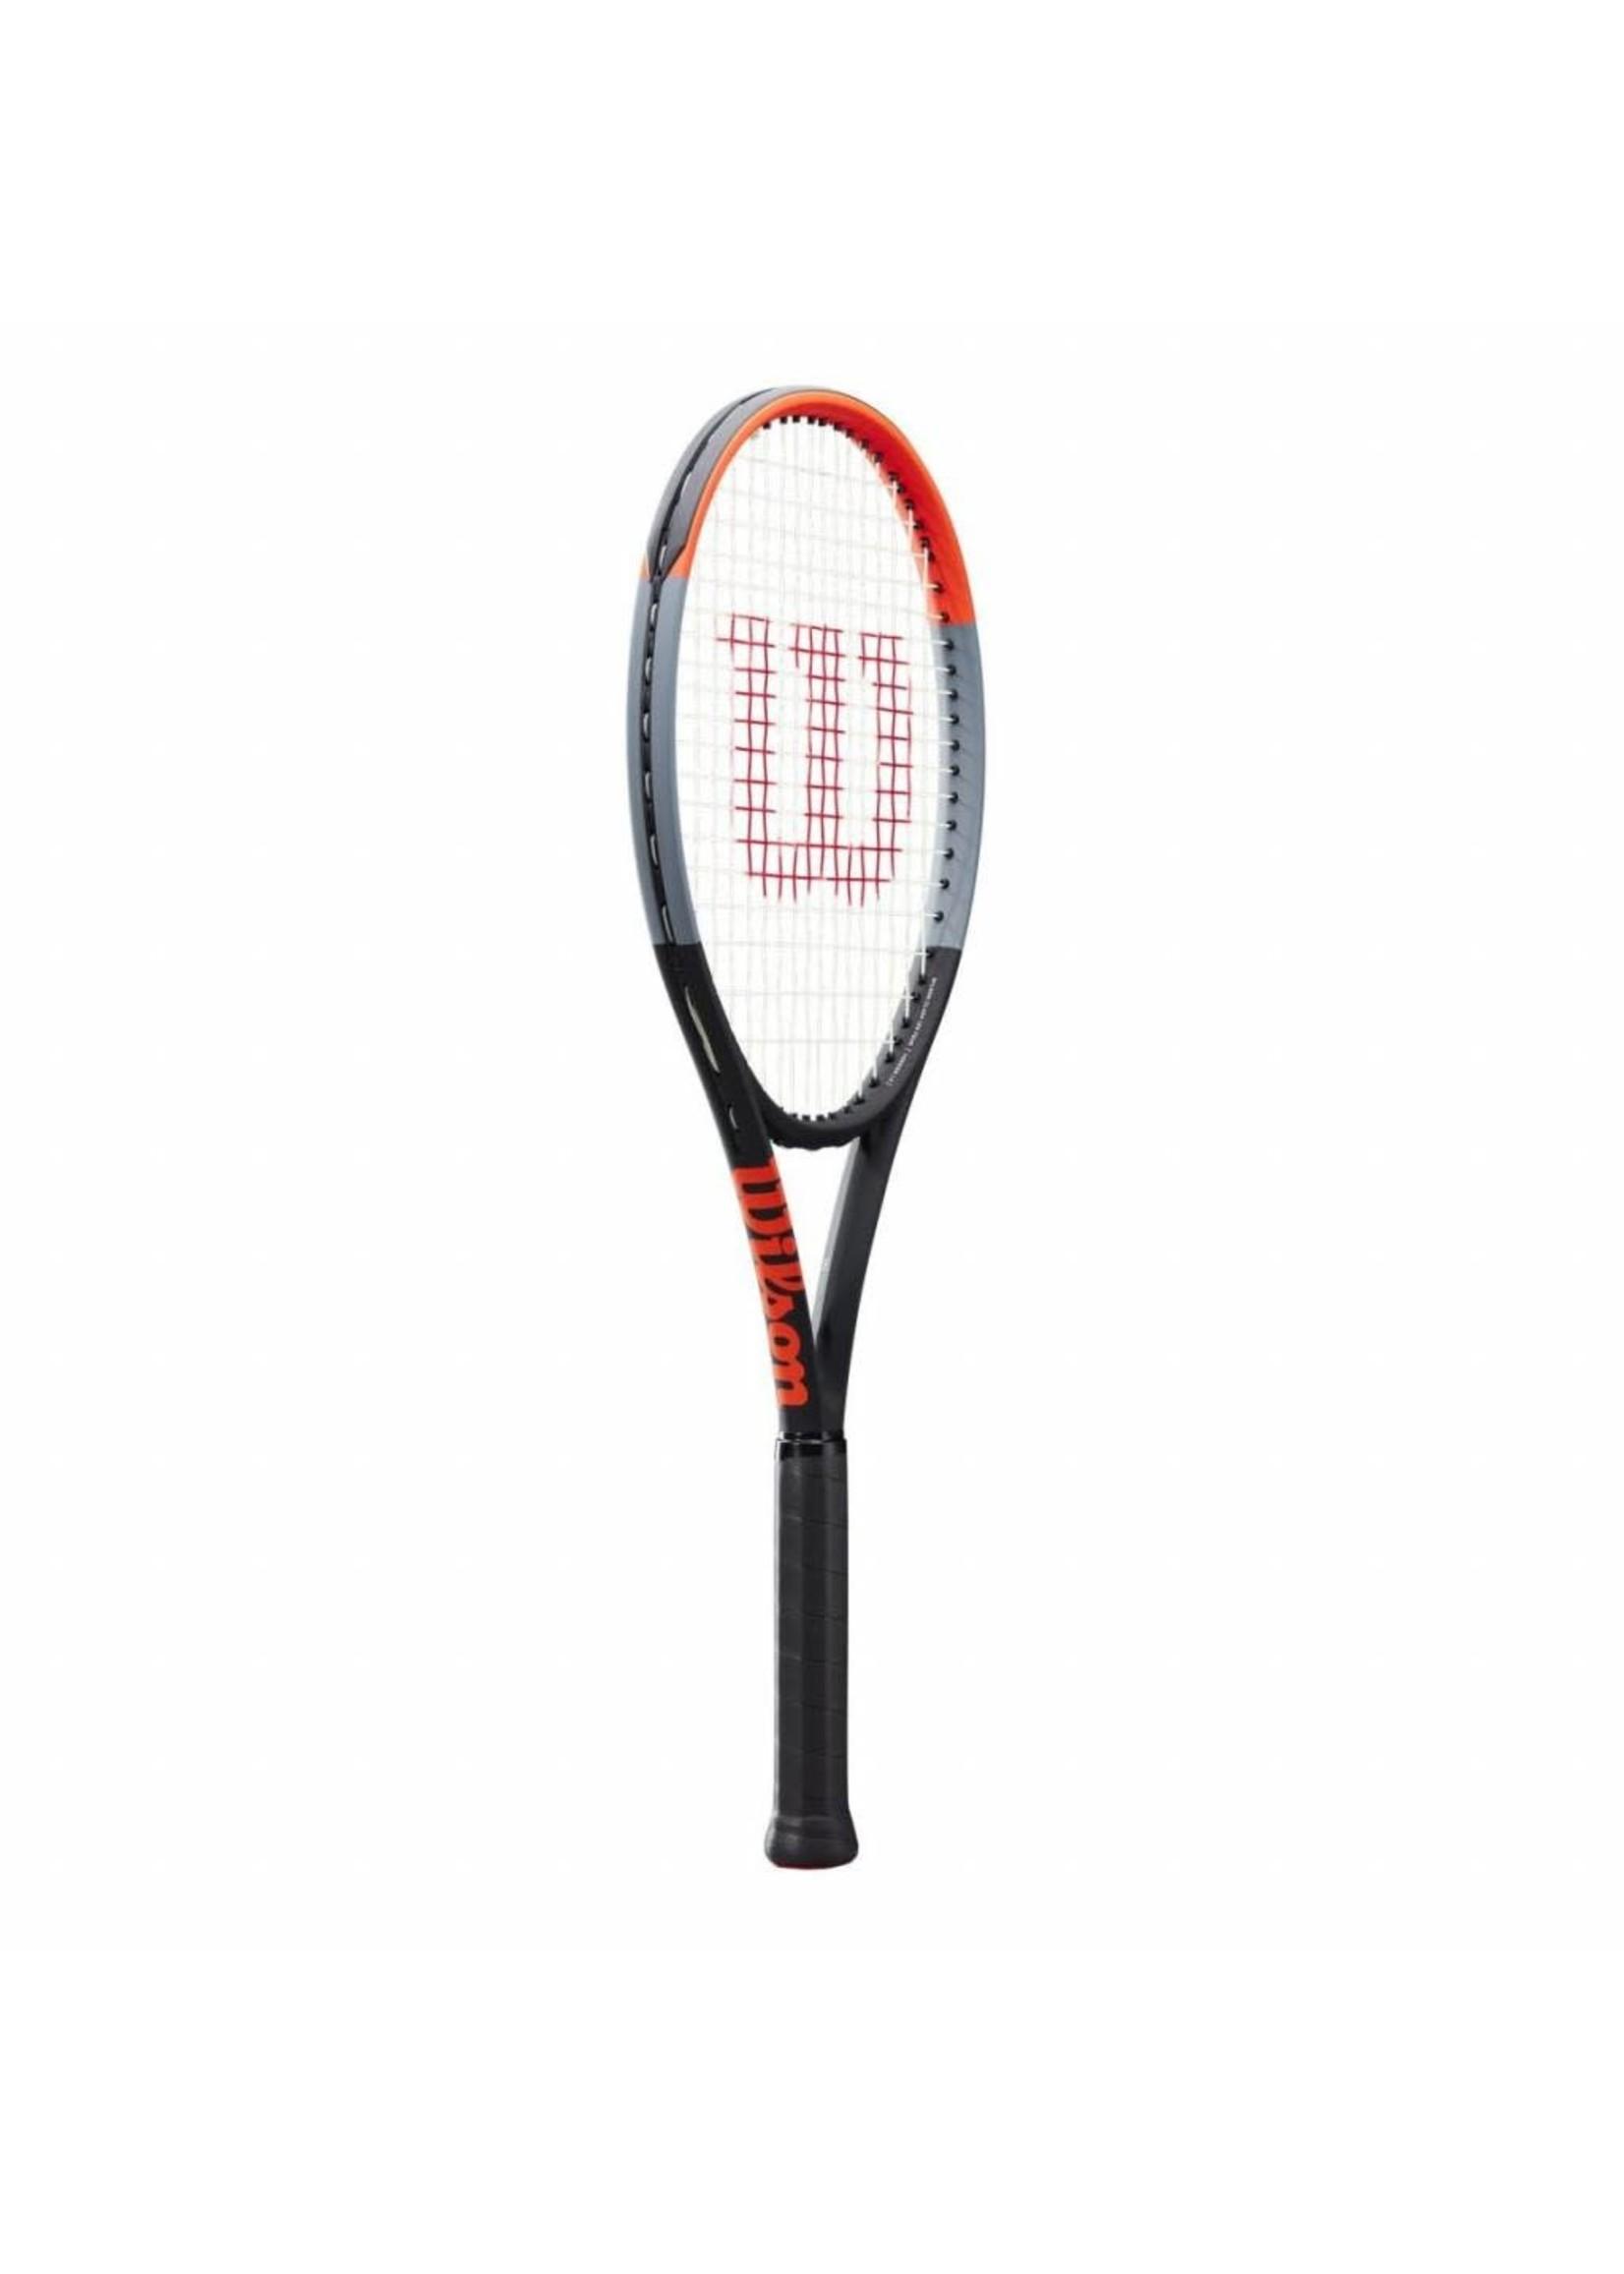 Wilson Wilson Clash 108 Tennis Racket (2019)